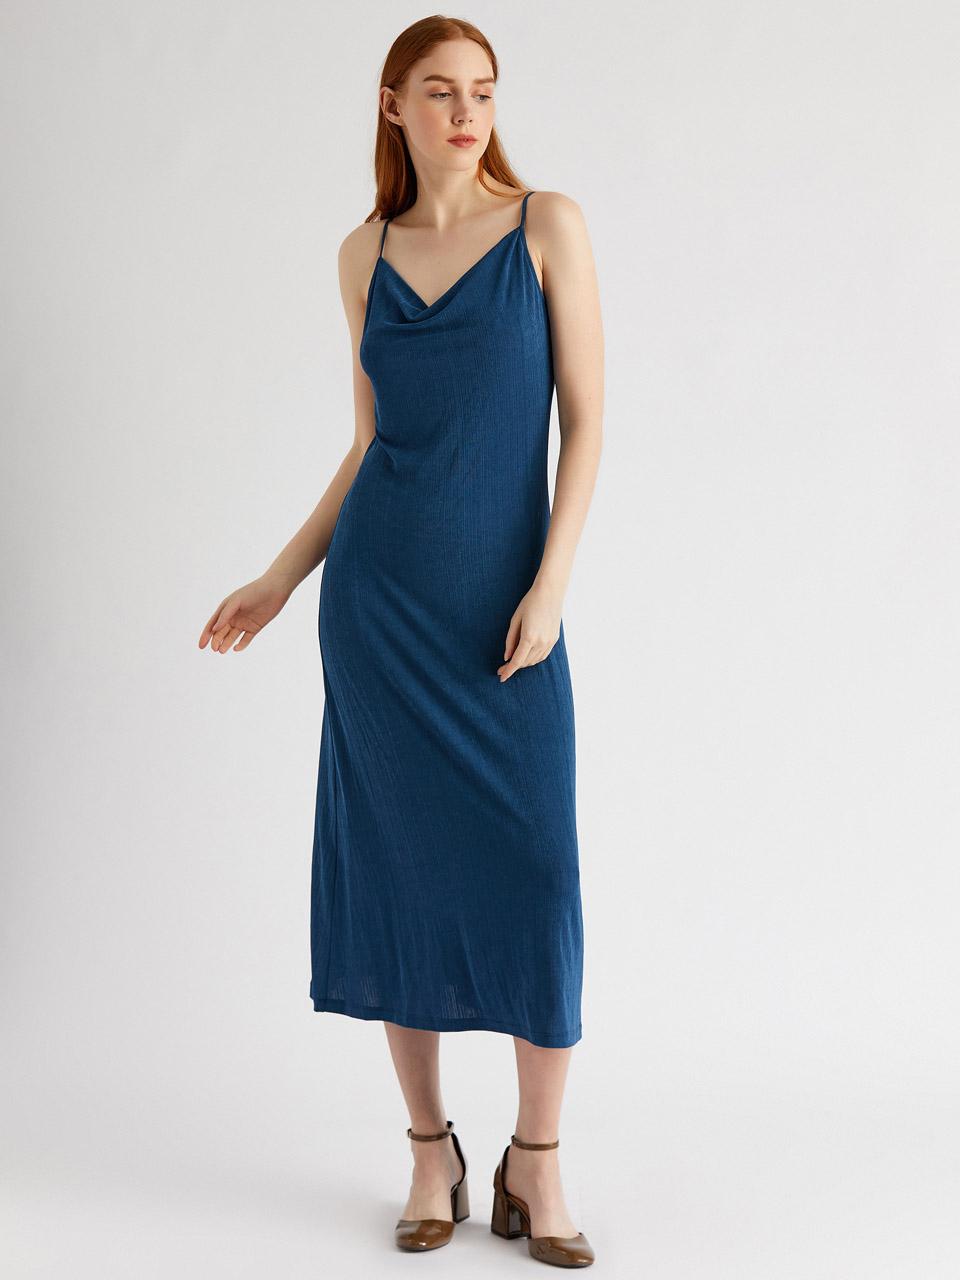 Hanging Midi Length Ribbed Dress